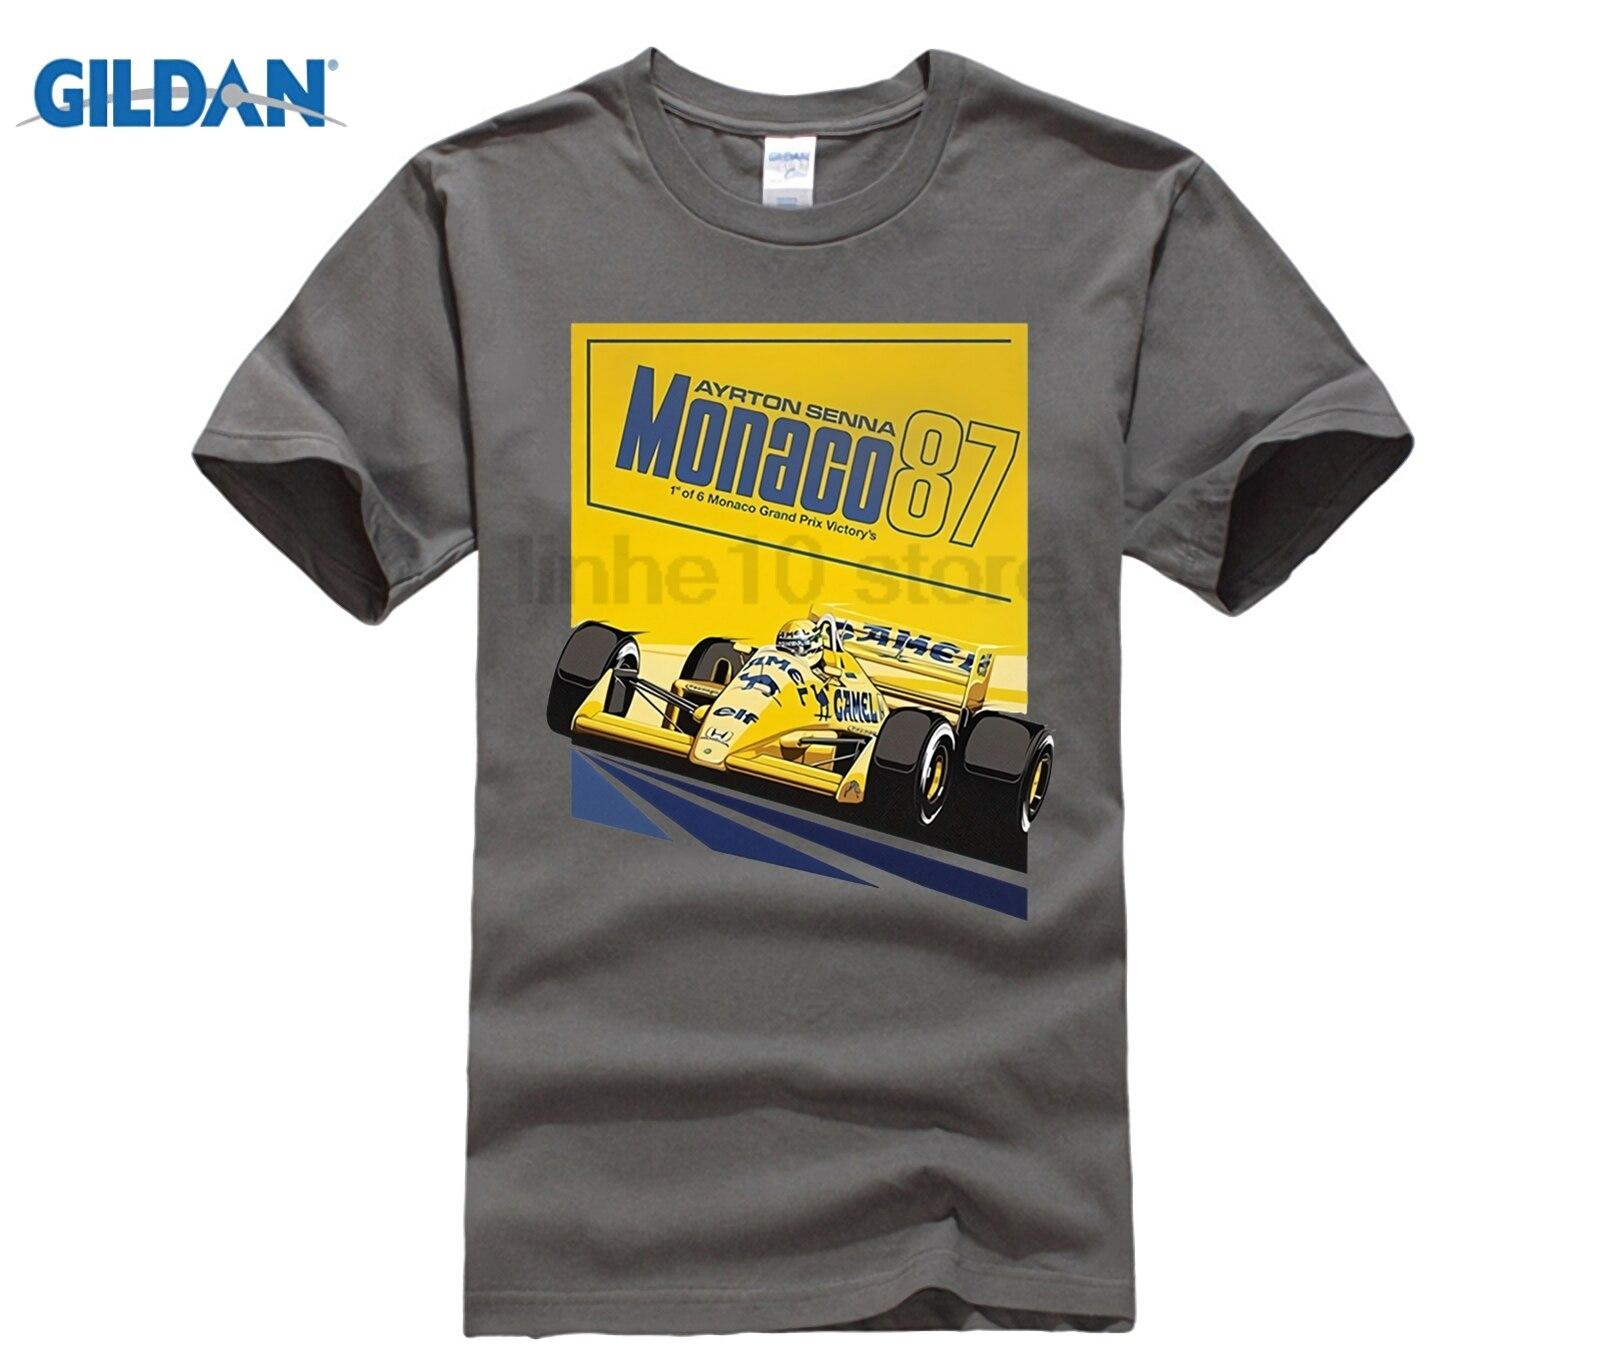 gildan-new-arrival-ayrton-font-b-senna-b-font-87-poster-tops-t-shirt-1-car-men-round-collar-short-sleeve-t-shirts